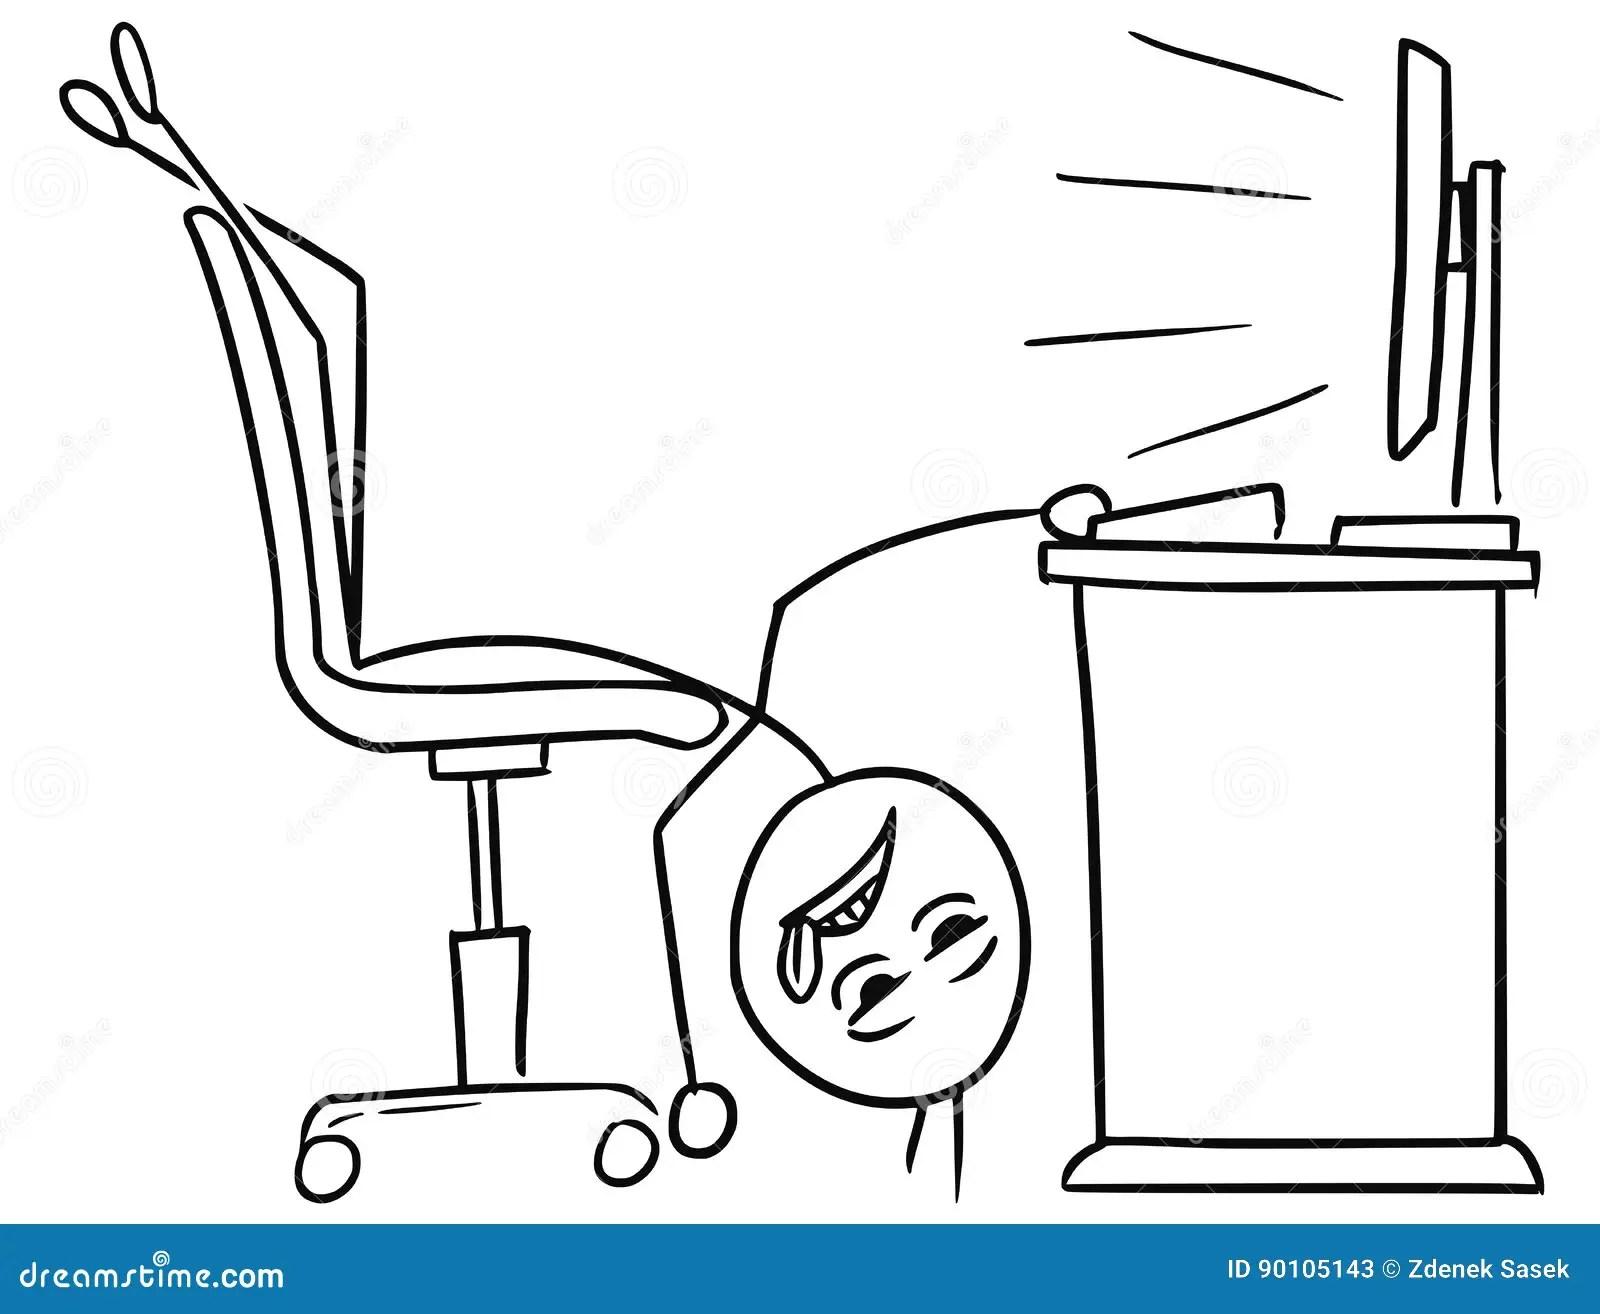 Vector Stick Man Cartoon Of Man Lying On The Office Chair